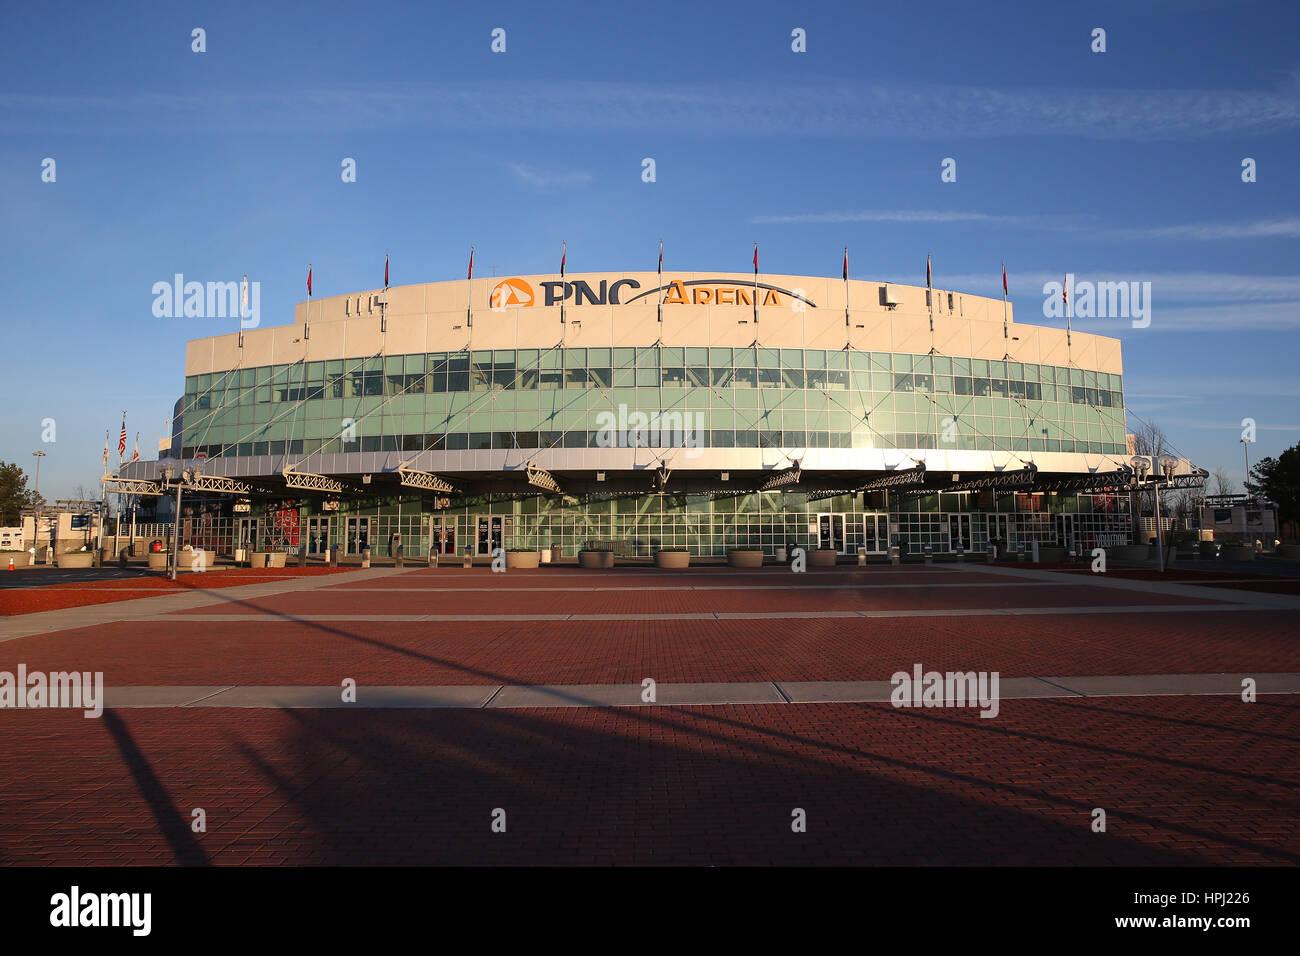 PNC Arena - Carolina Hurricanes - Stock Image